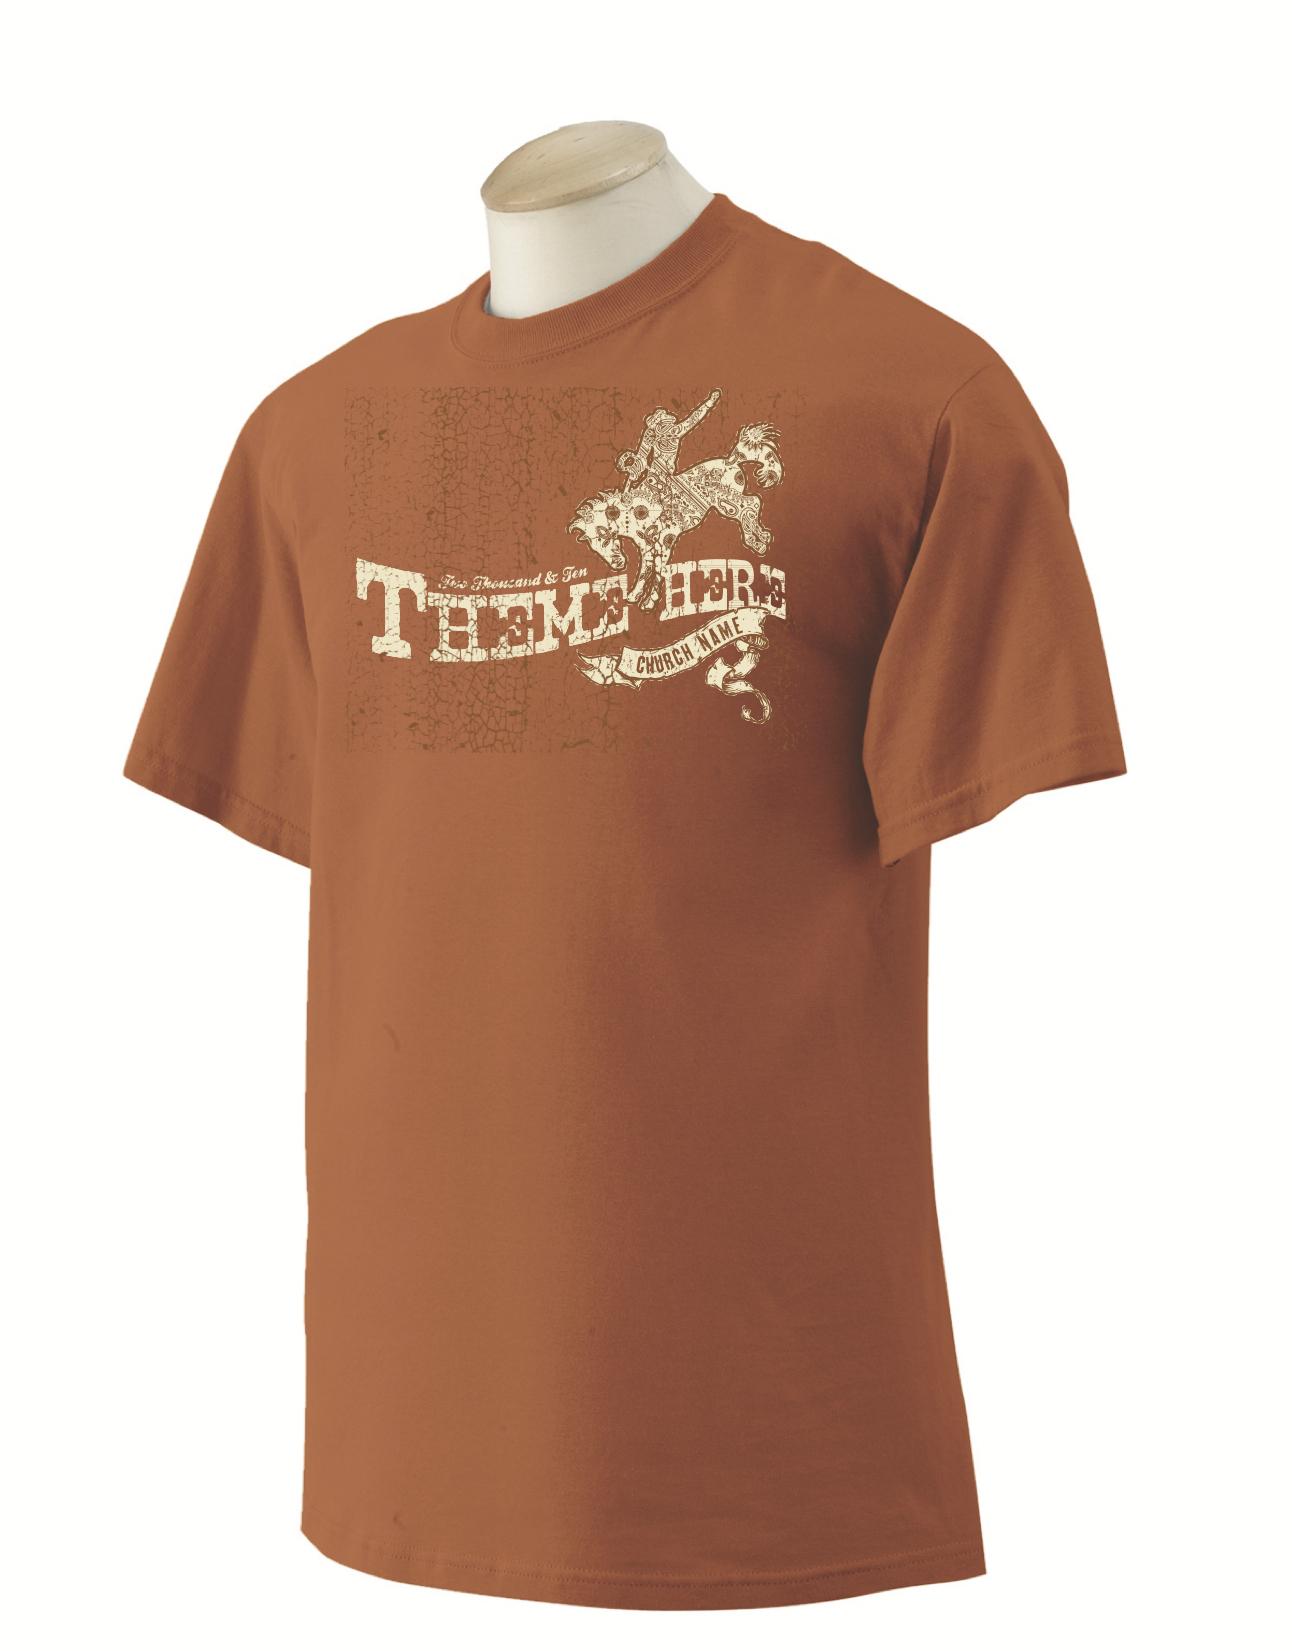 ranch 1 texas orange shirt.jpg